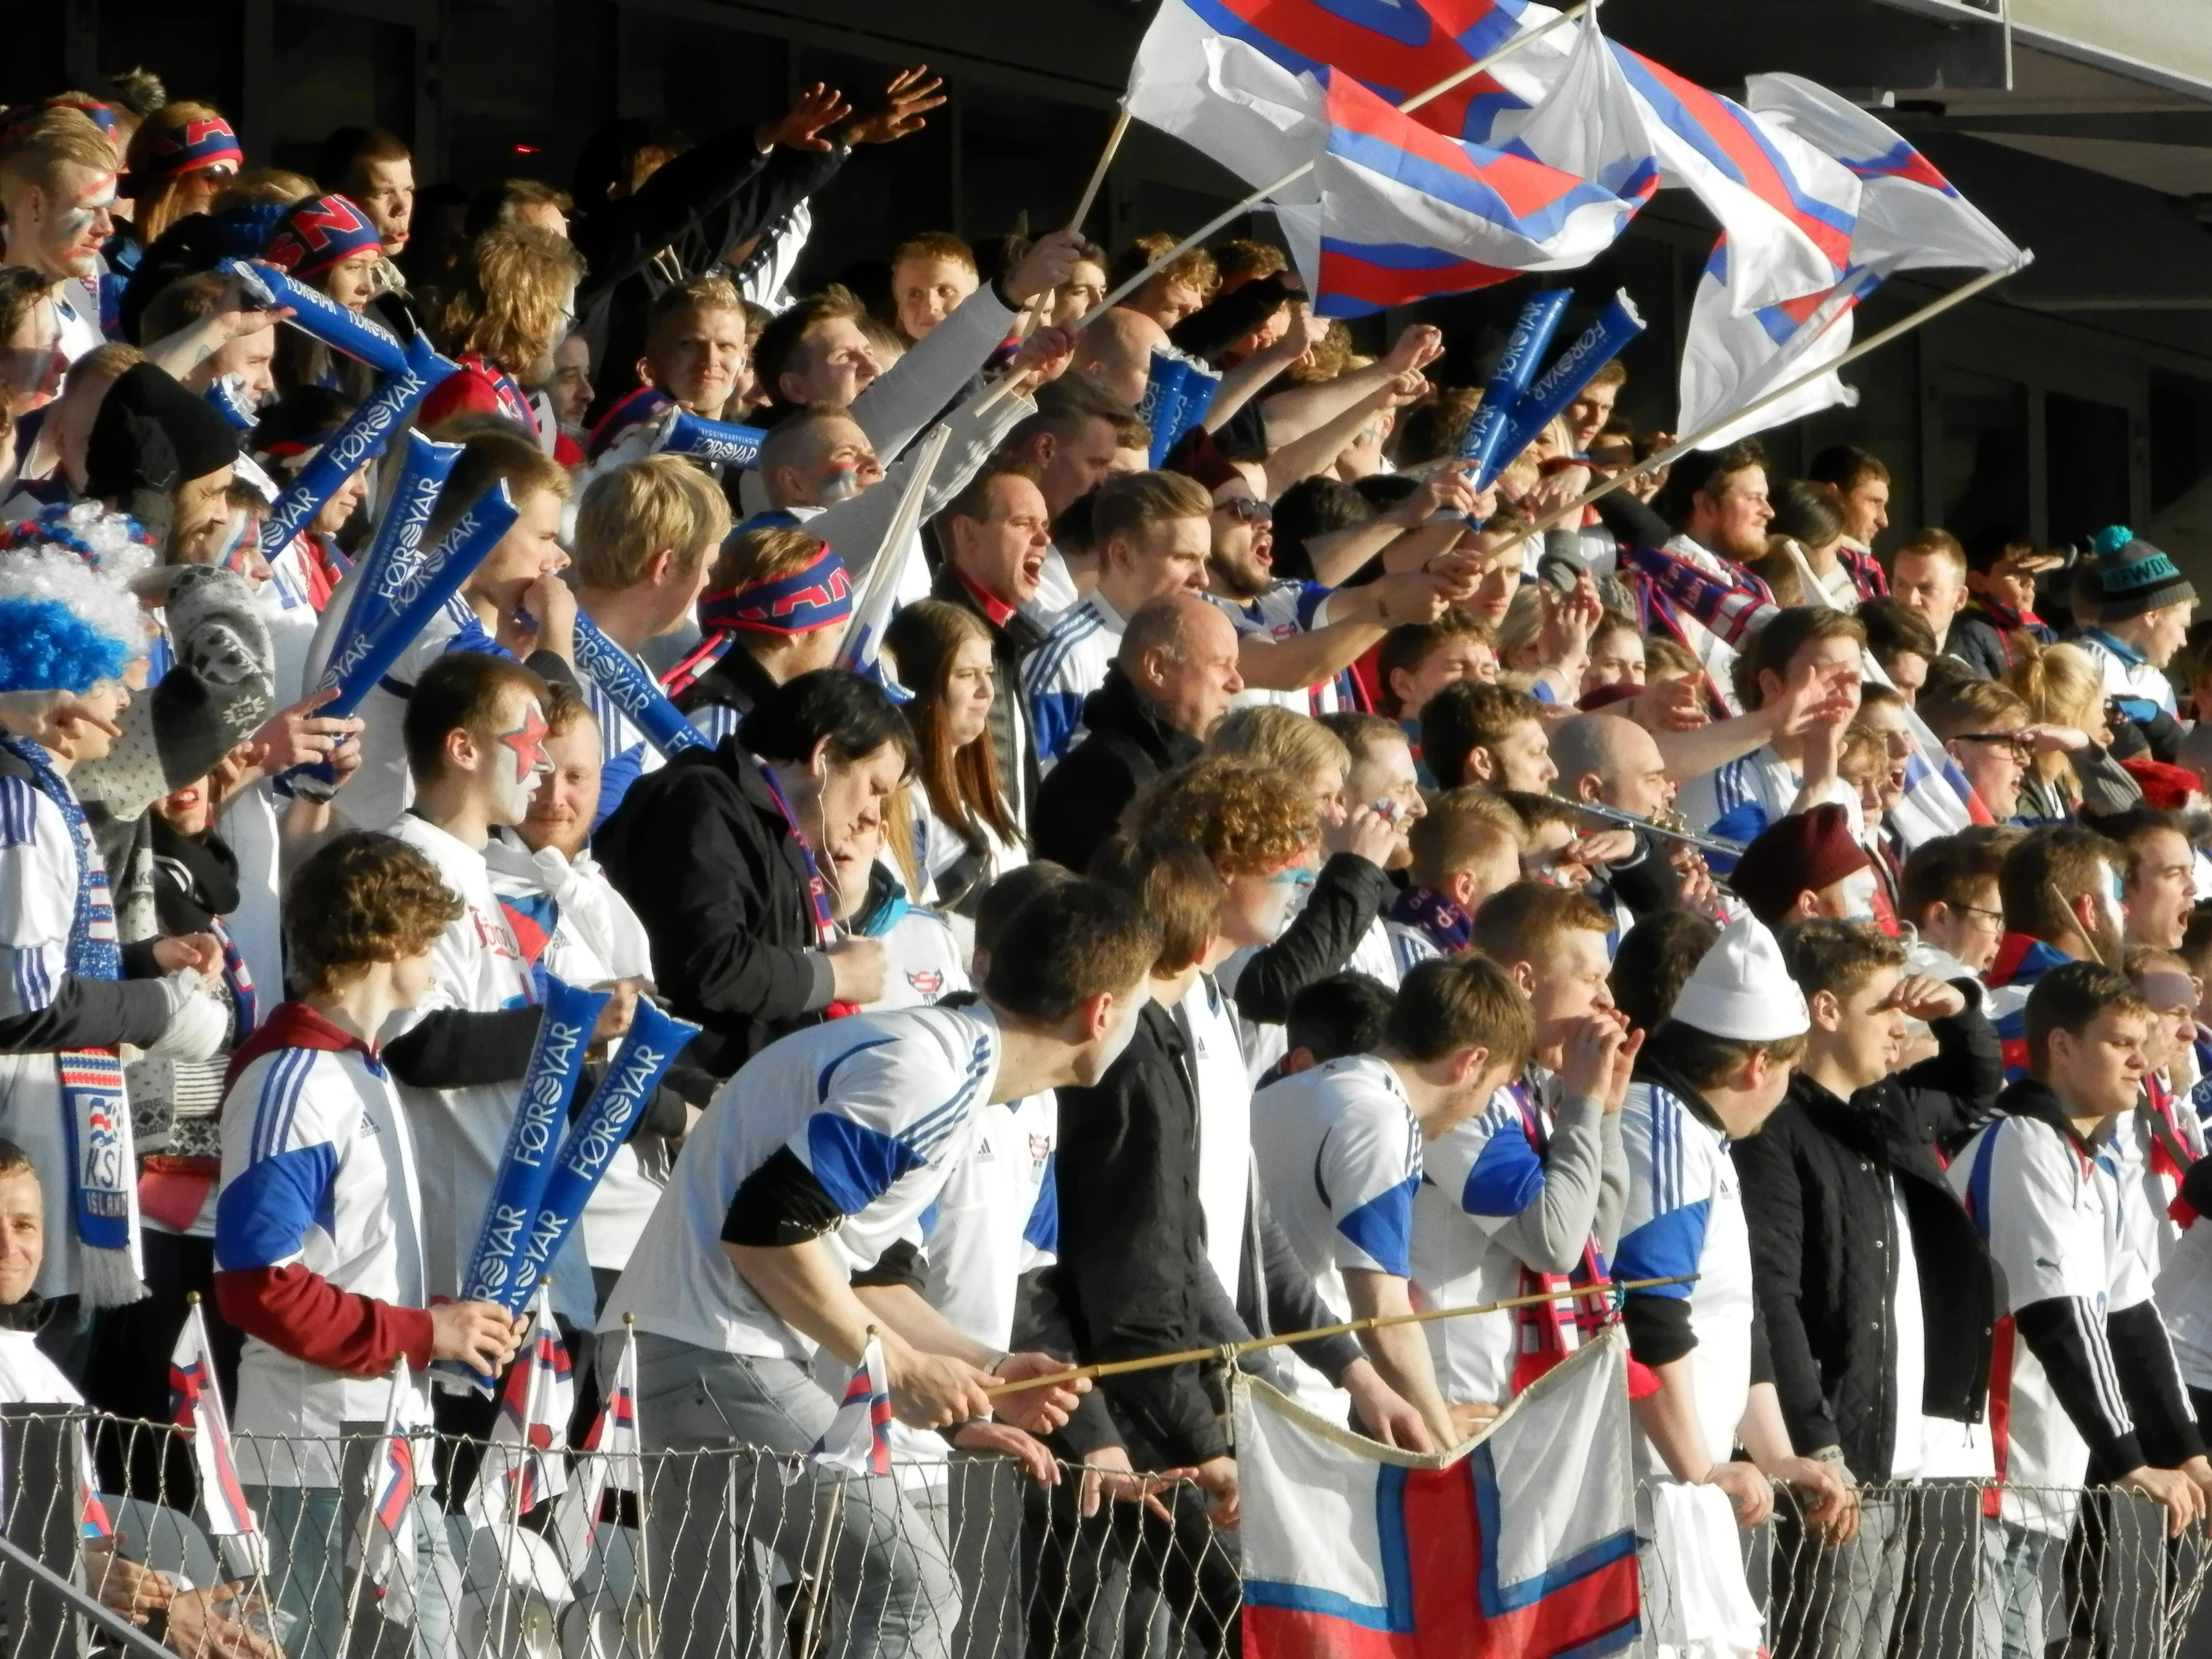 Faroese_football_supporters_-_Skansin_-_13_June_2015.JPG